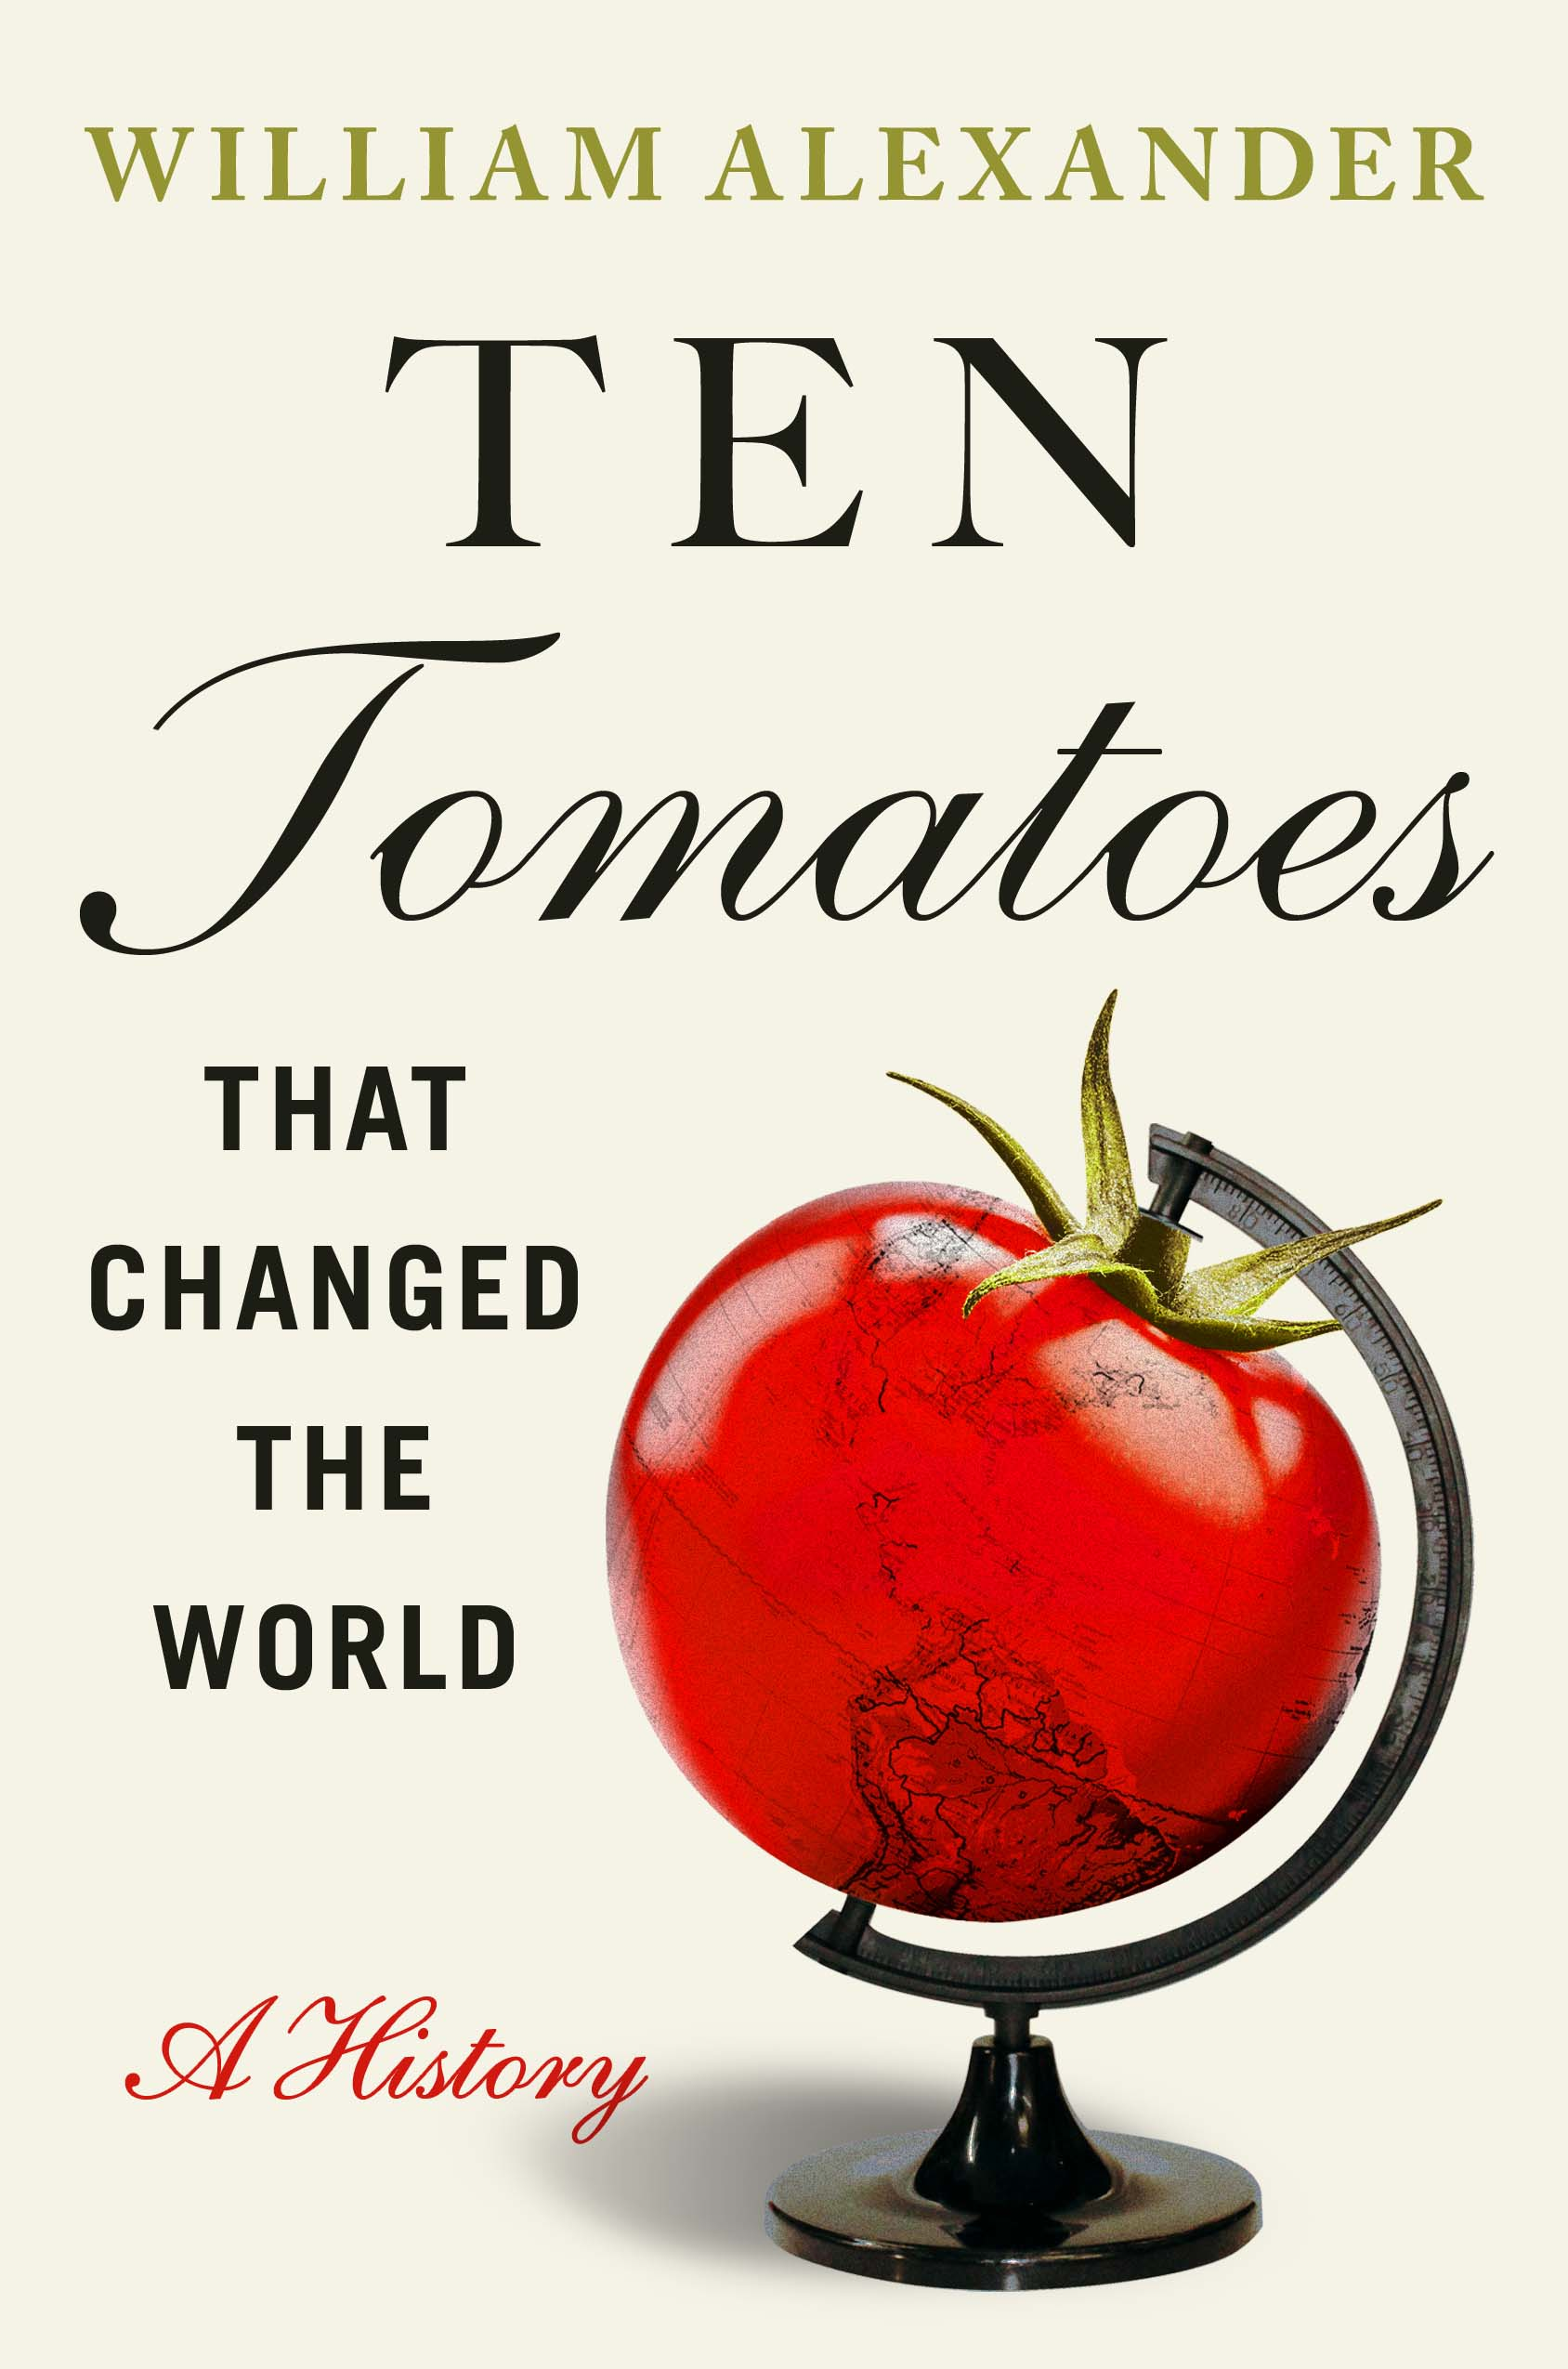 Burpee Europe – Bringing The Magic of Tomatoes To Chelsea